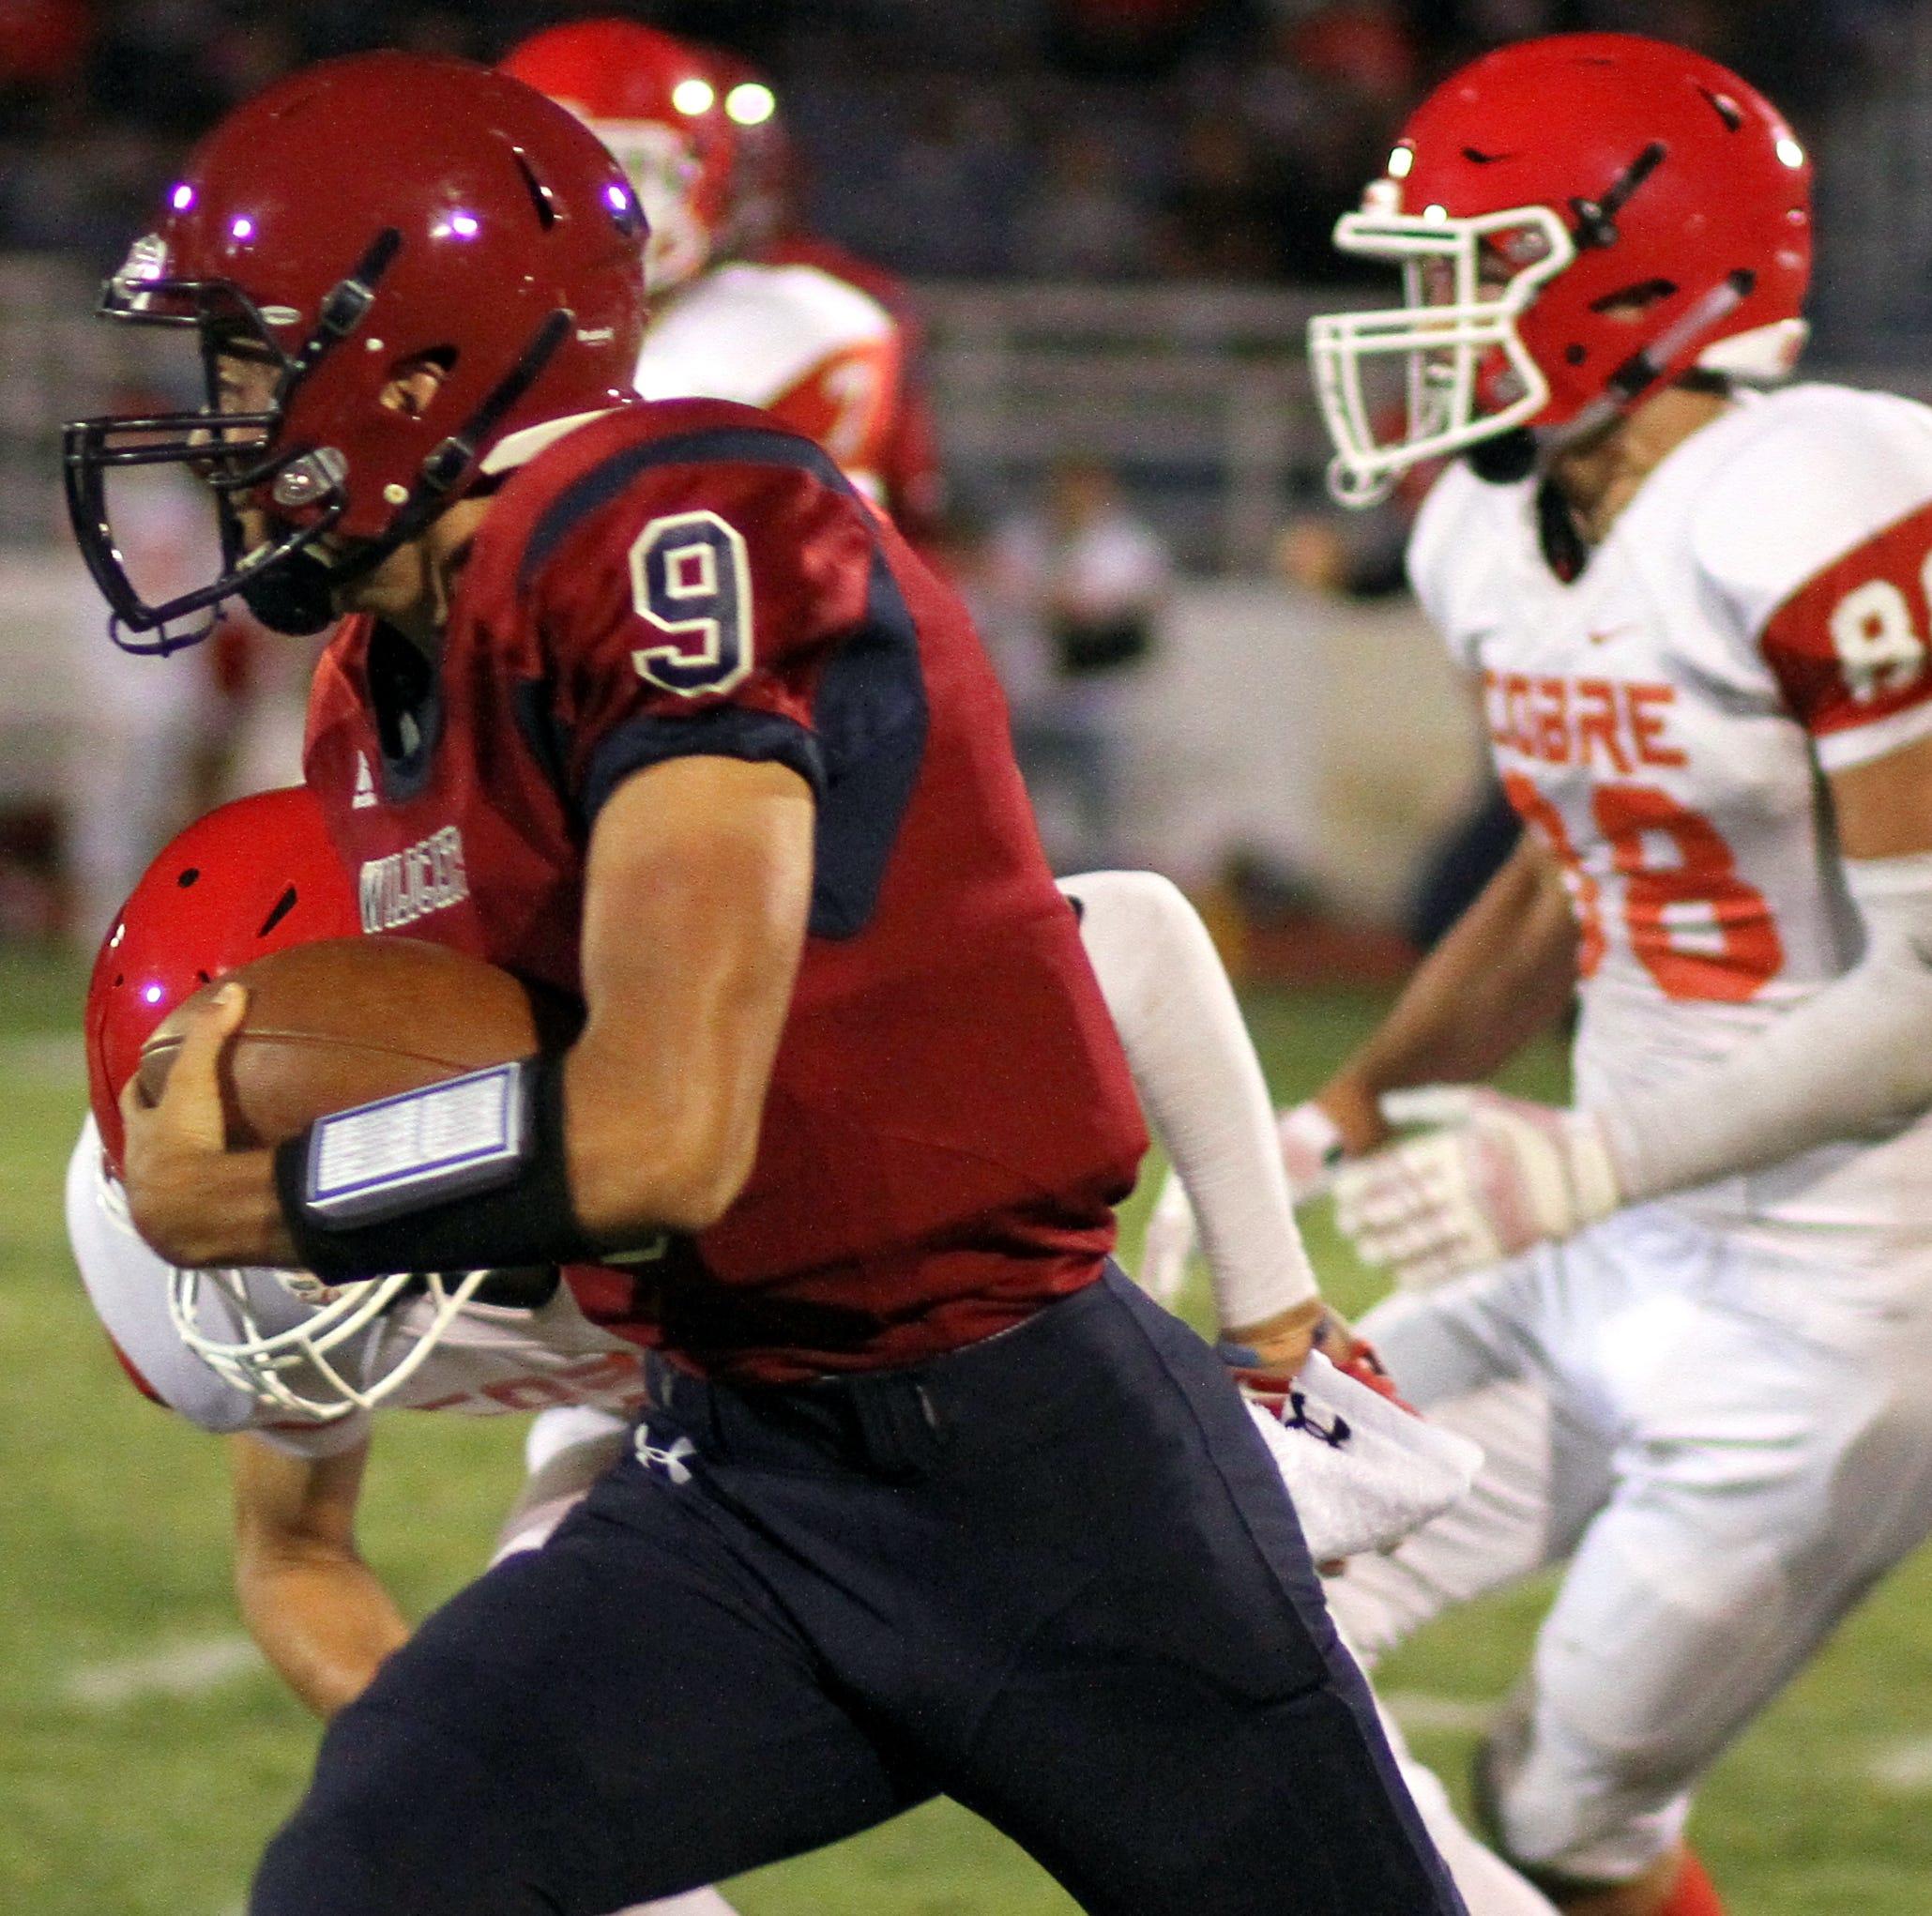 Senior Wildcat quarterback Daniel Garcia (9) will be on the run come Friday night against the Santa Teresa desert Warriors.